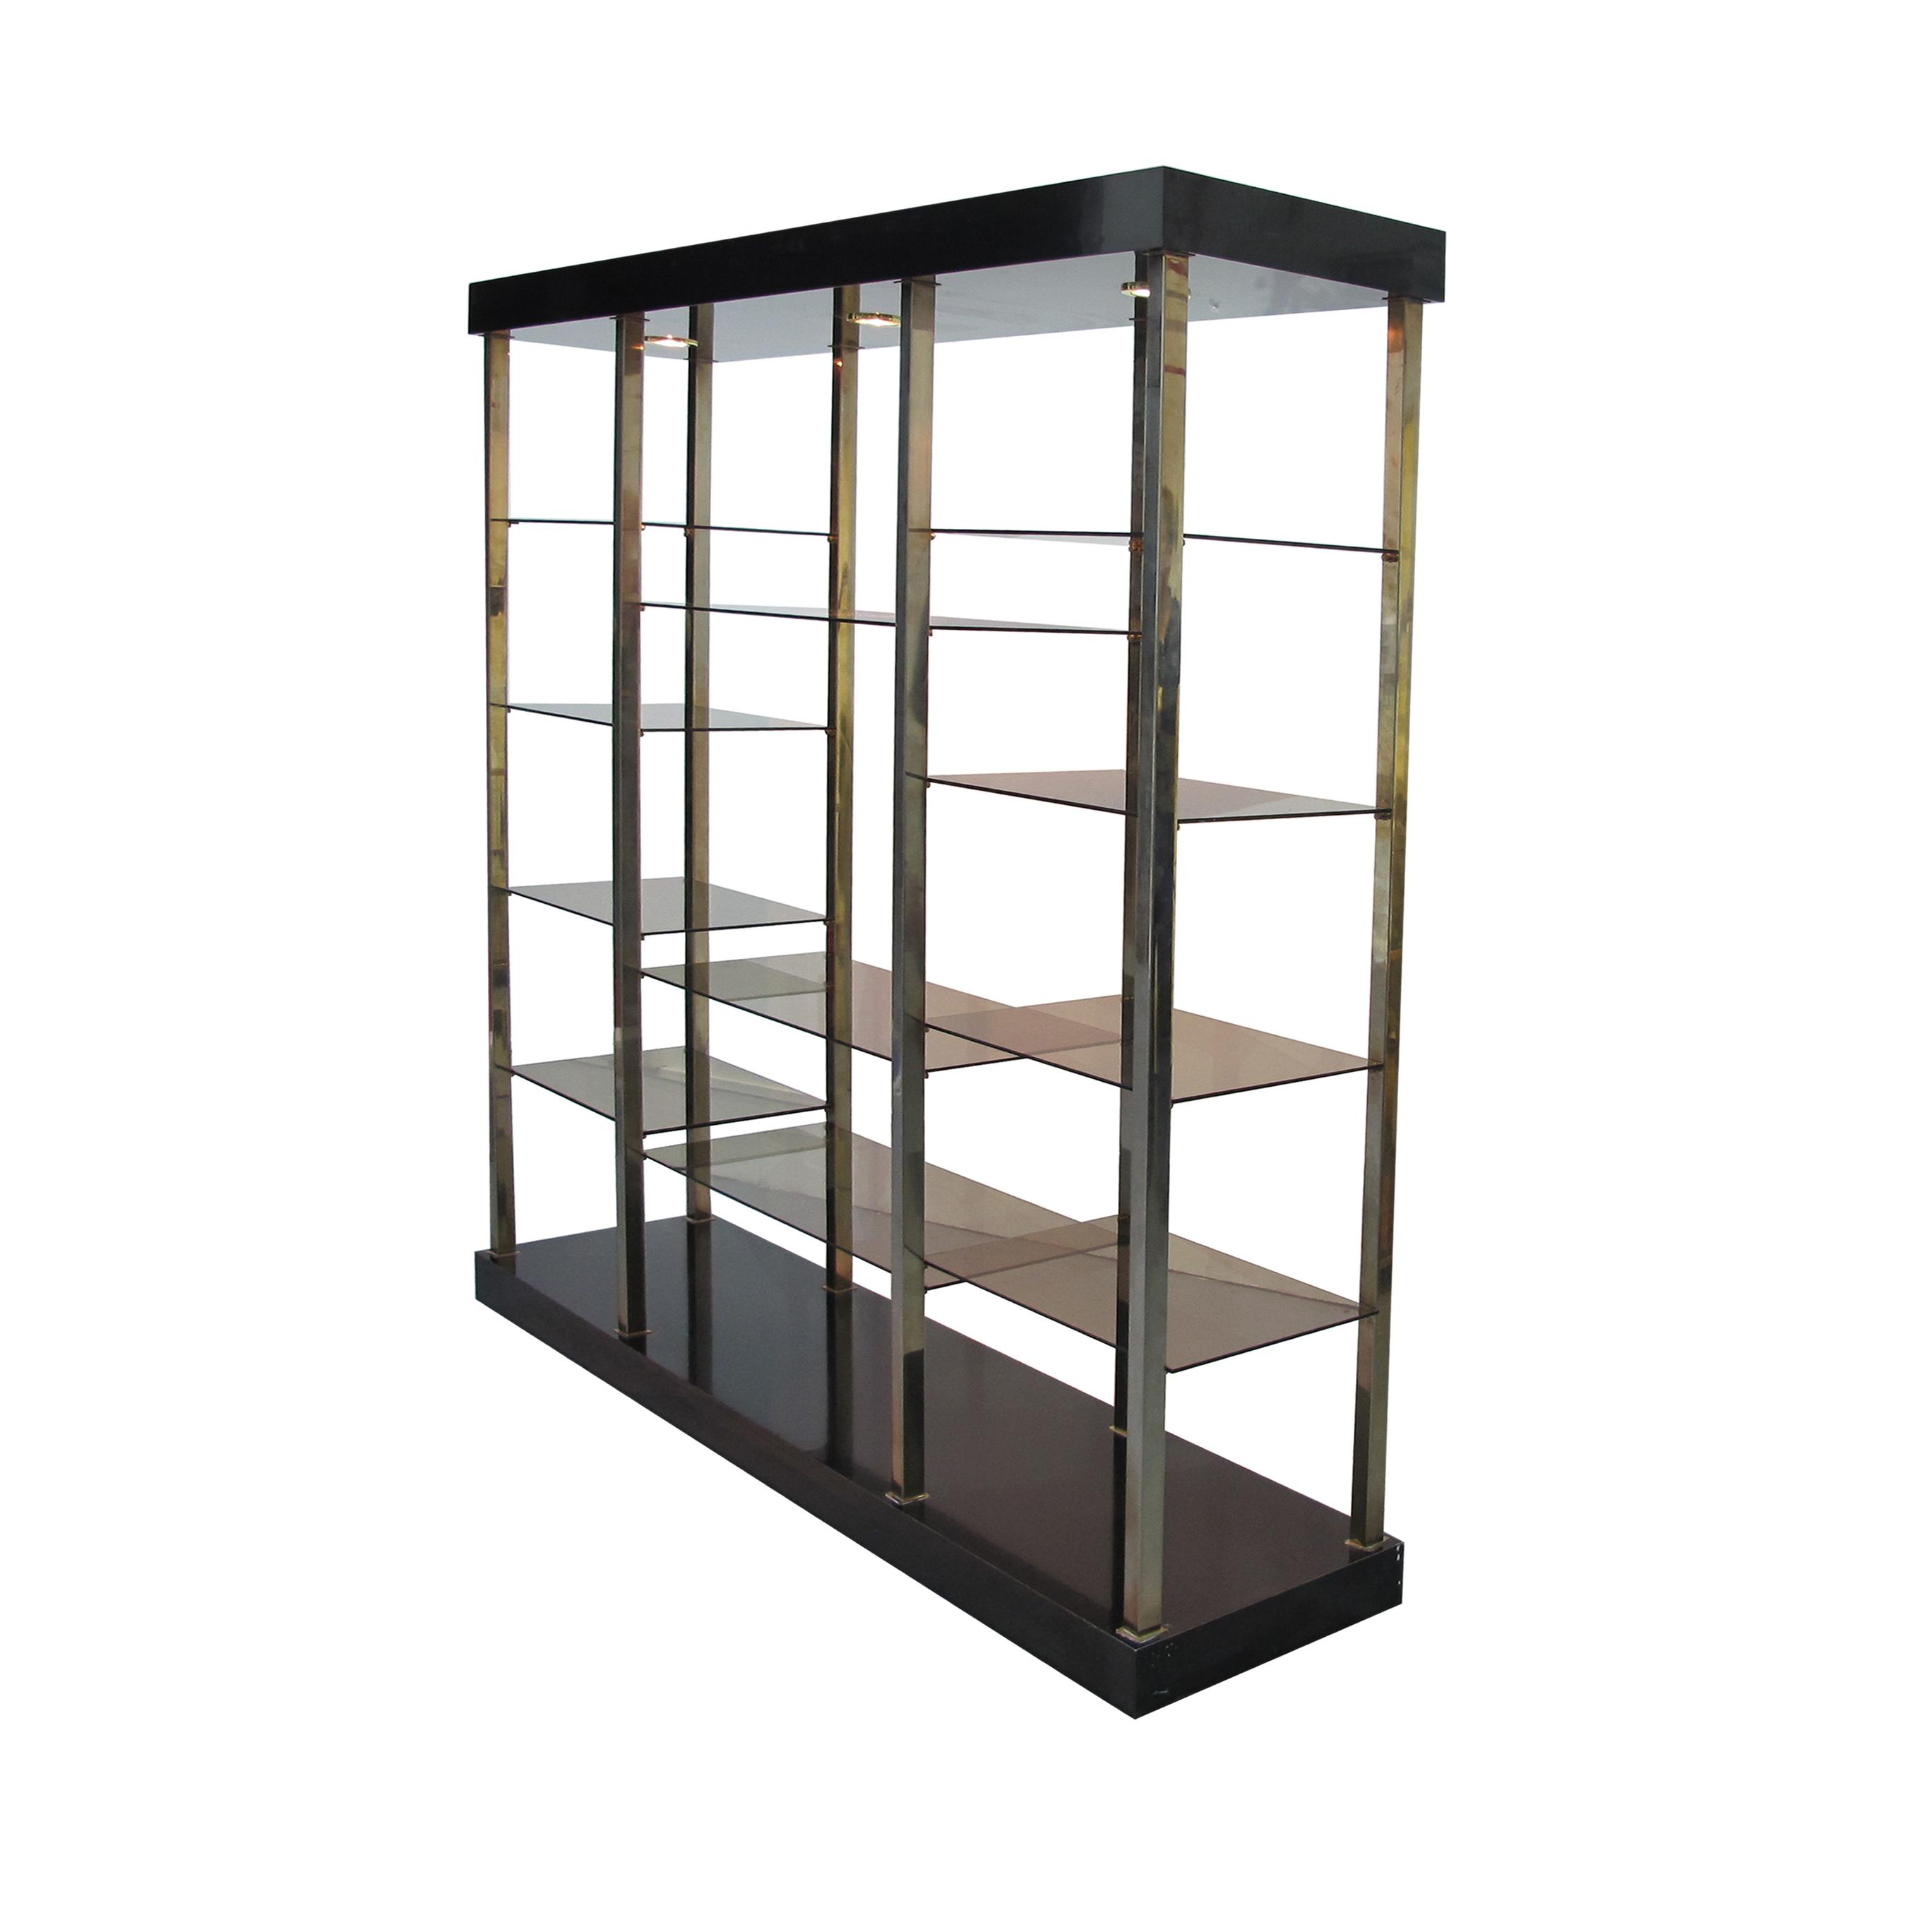 chrome and glass shelving unit interesting chrome steel. Black Bedroom Furniture Sets. Home Design Ideas